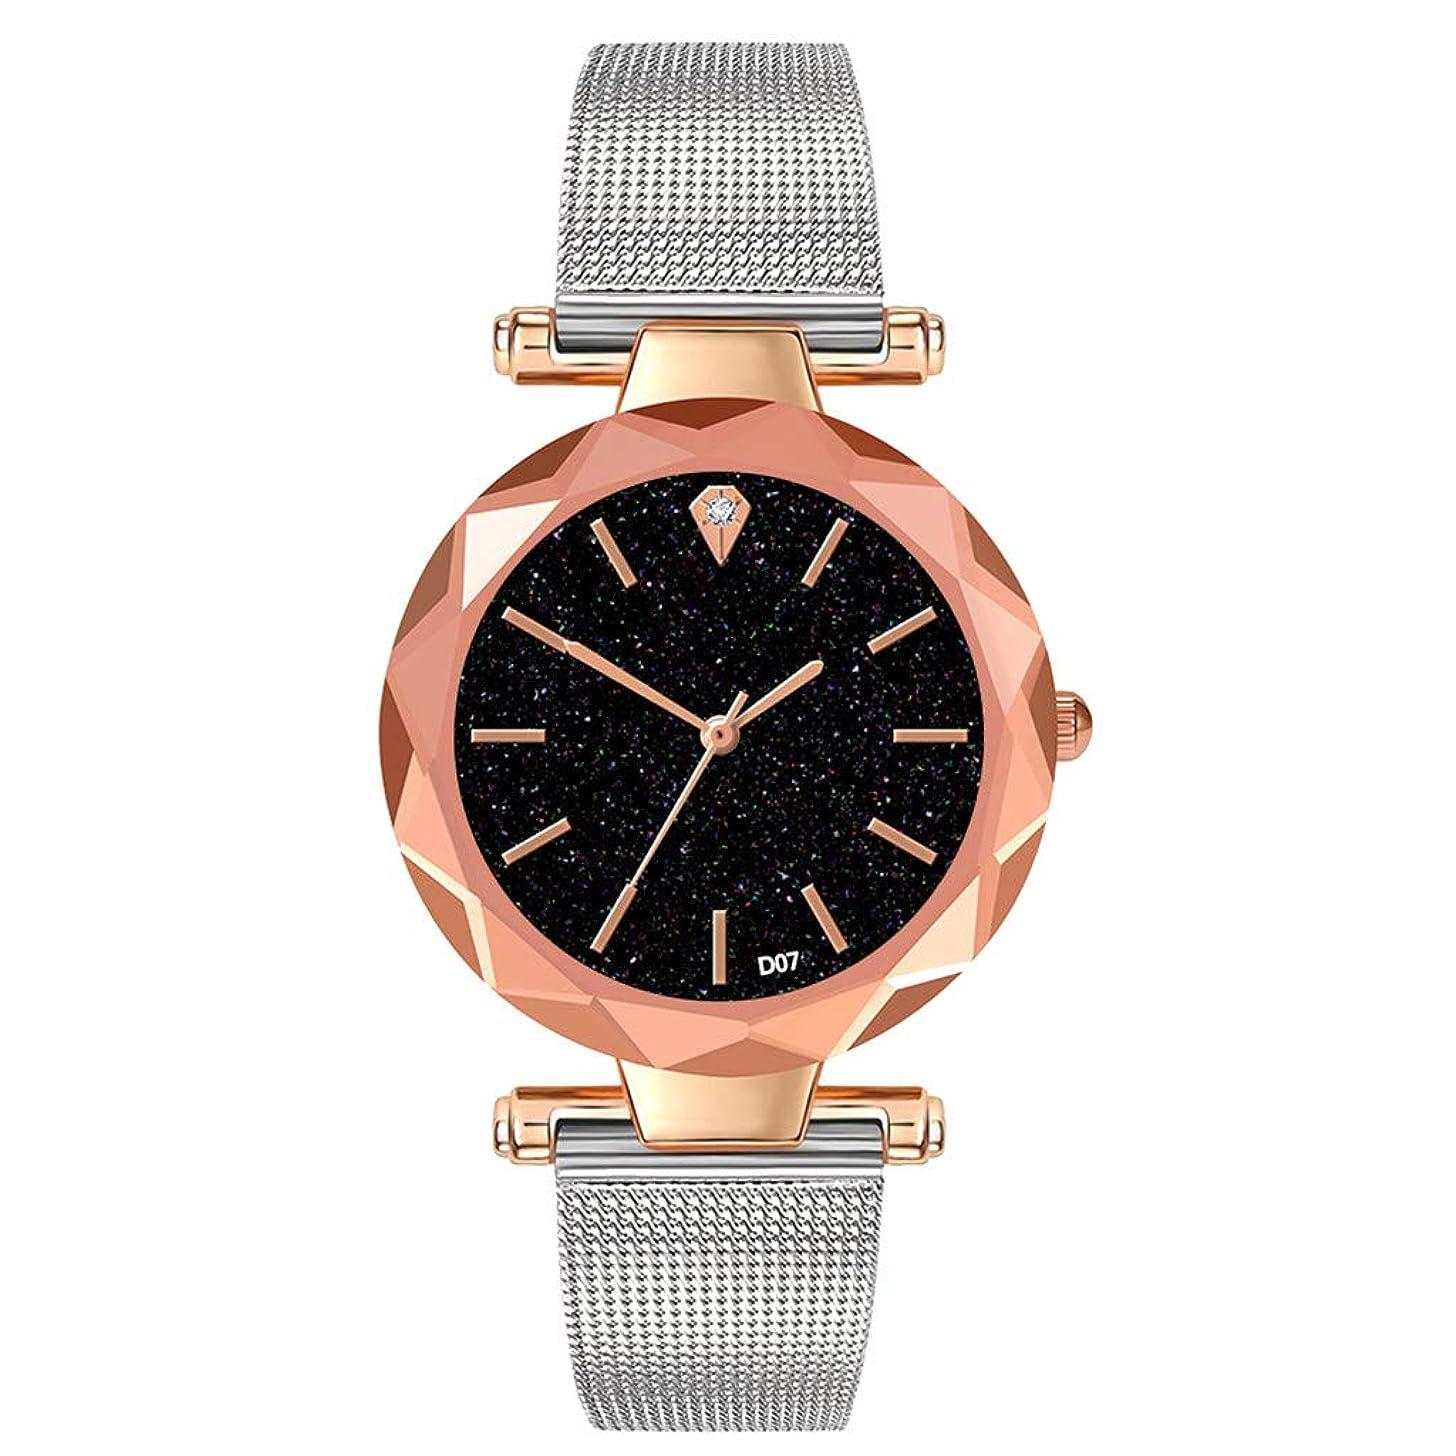 LUCAMORE Fashion Women's Quartz Watches On Sale Starry Dial Buckle Mesh Strap Elegant Wristwatch